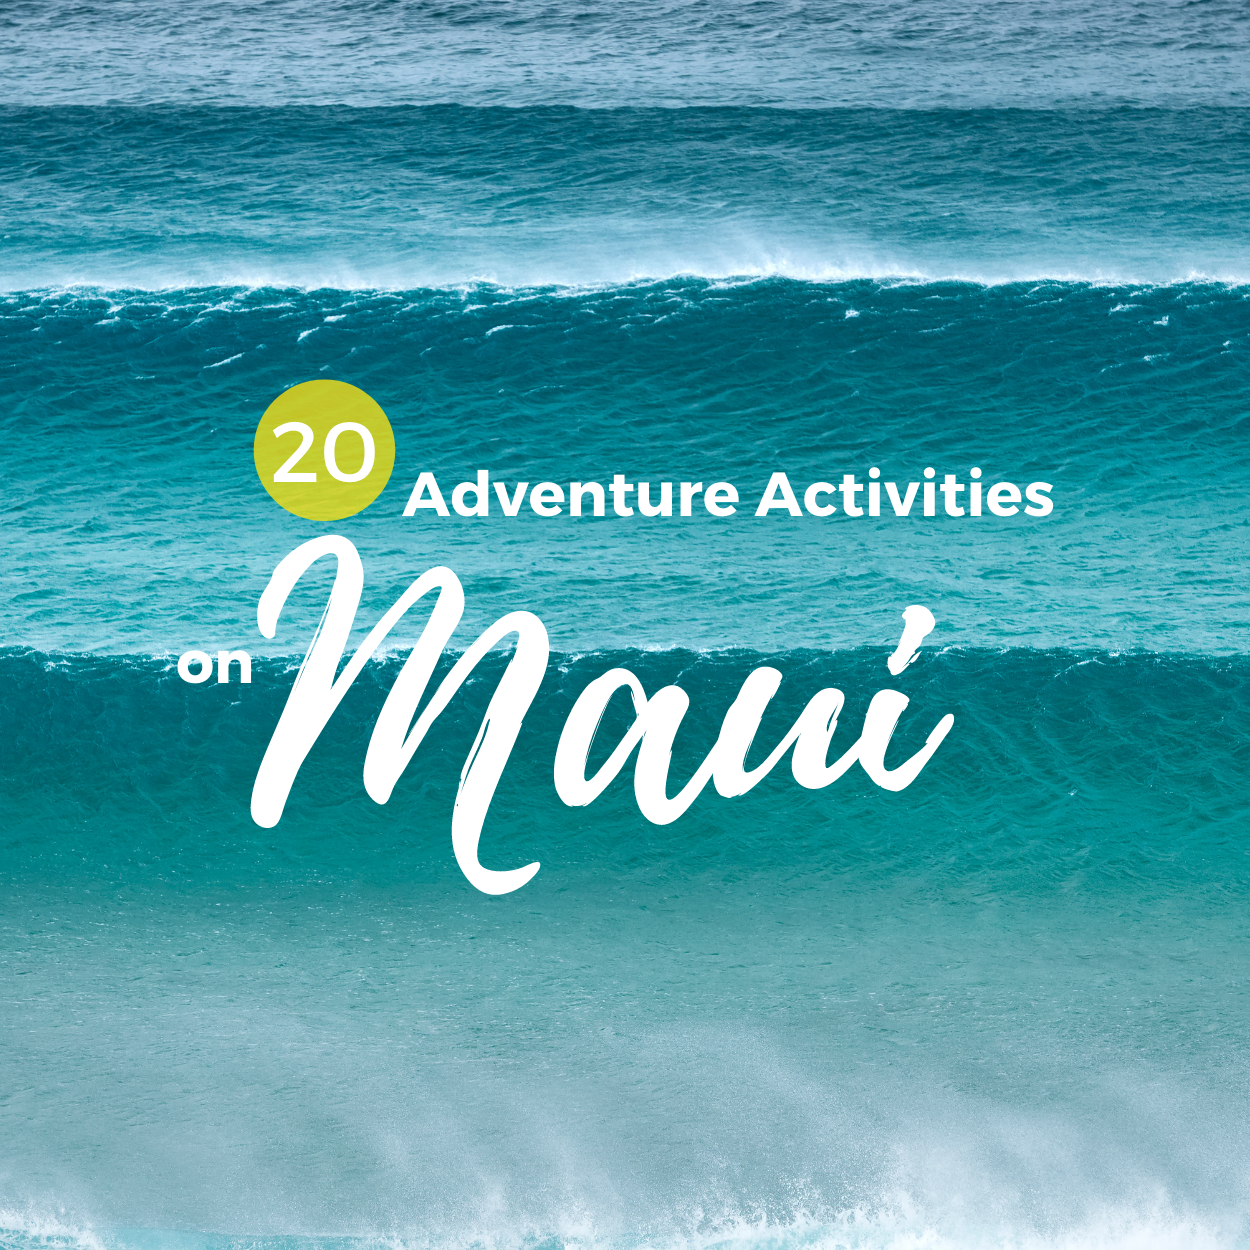 Top 20 Adventure Activities on Maui